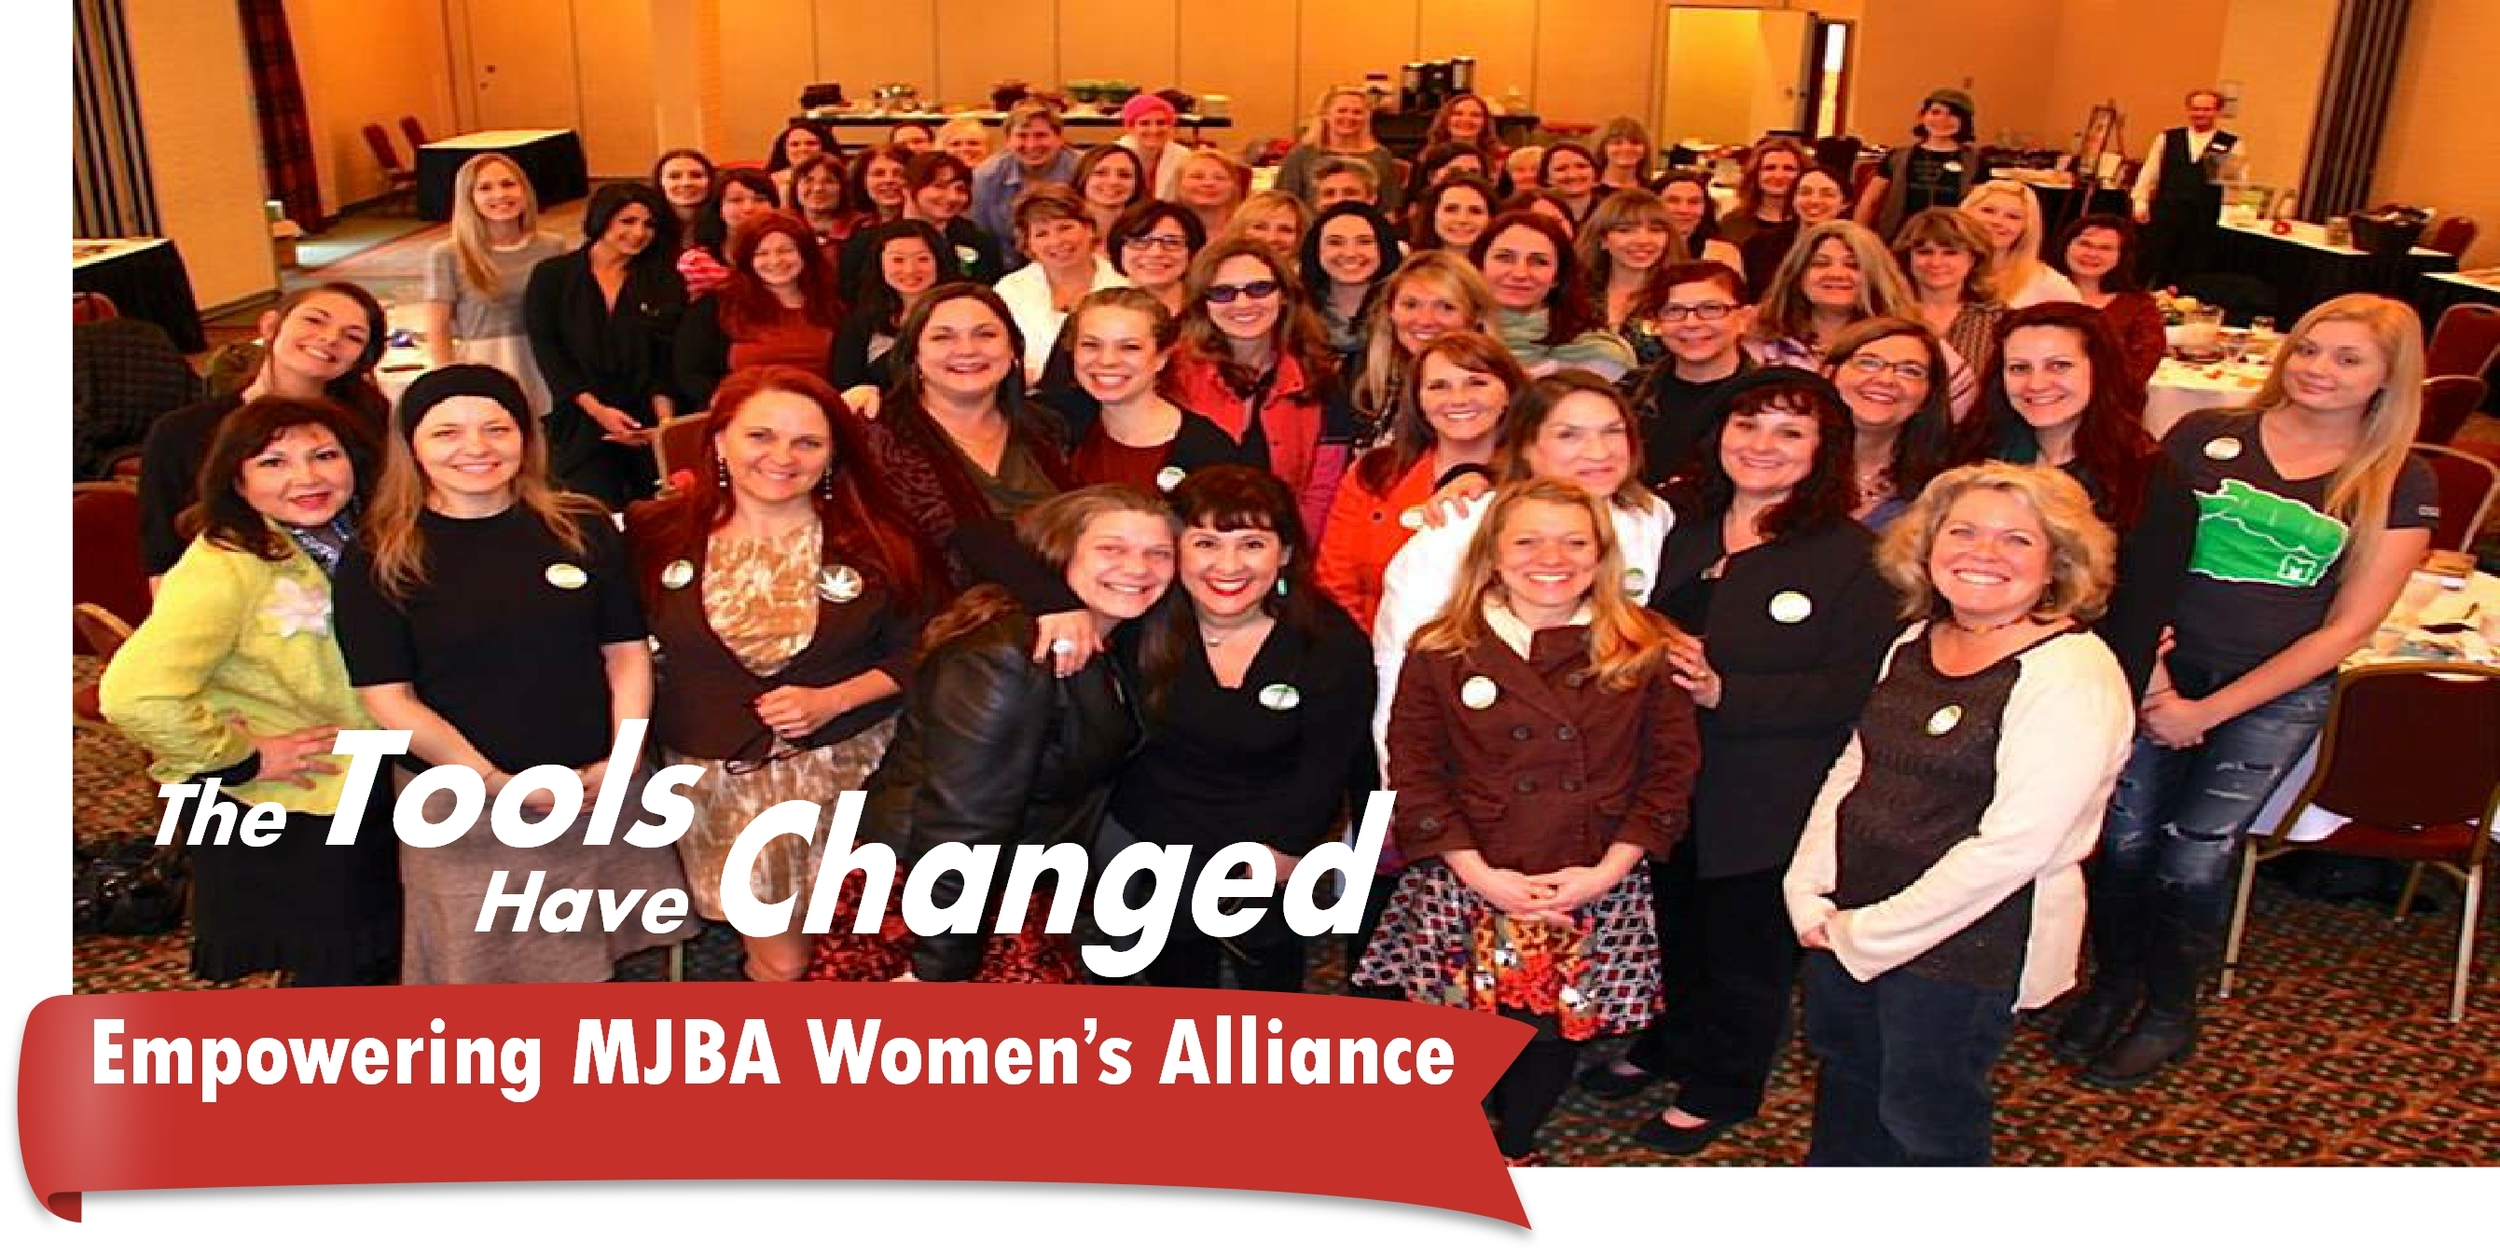 Customer MJBA Womens Alliance.jpg